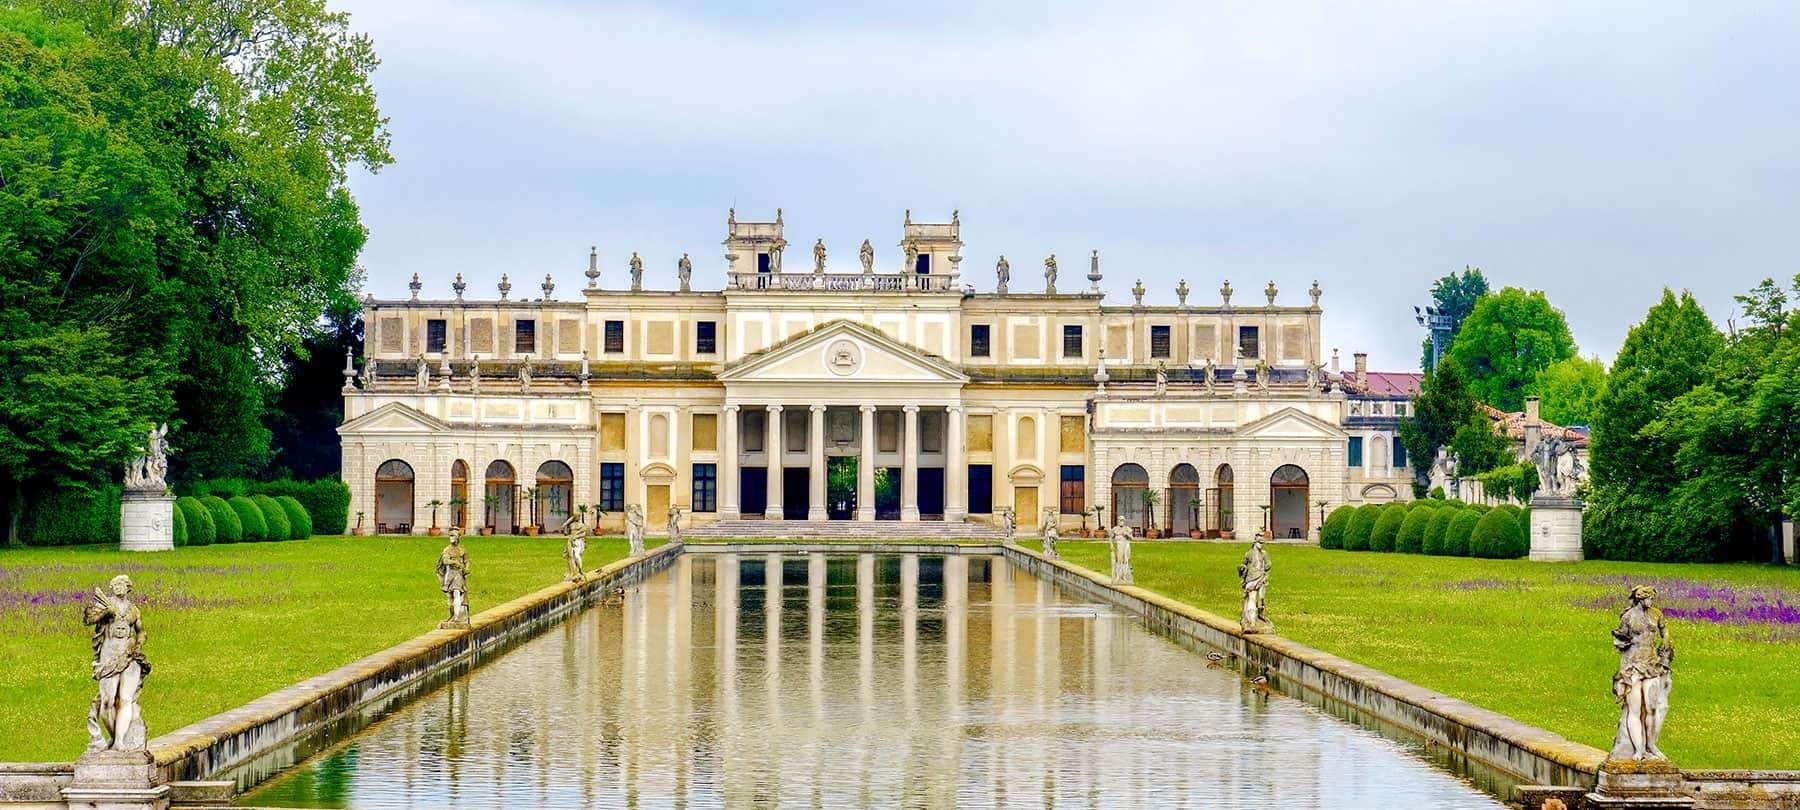 Villa Pisani - © Vaghis - viaggi & turismo Italia - Tutti-i-diritti riservati